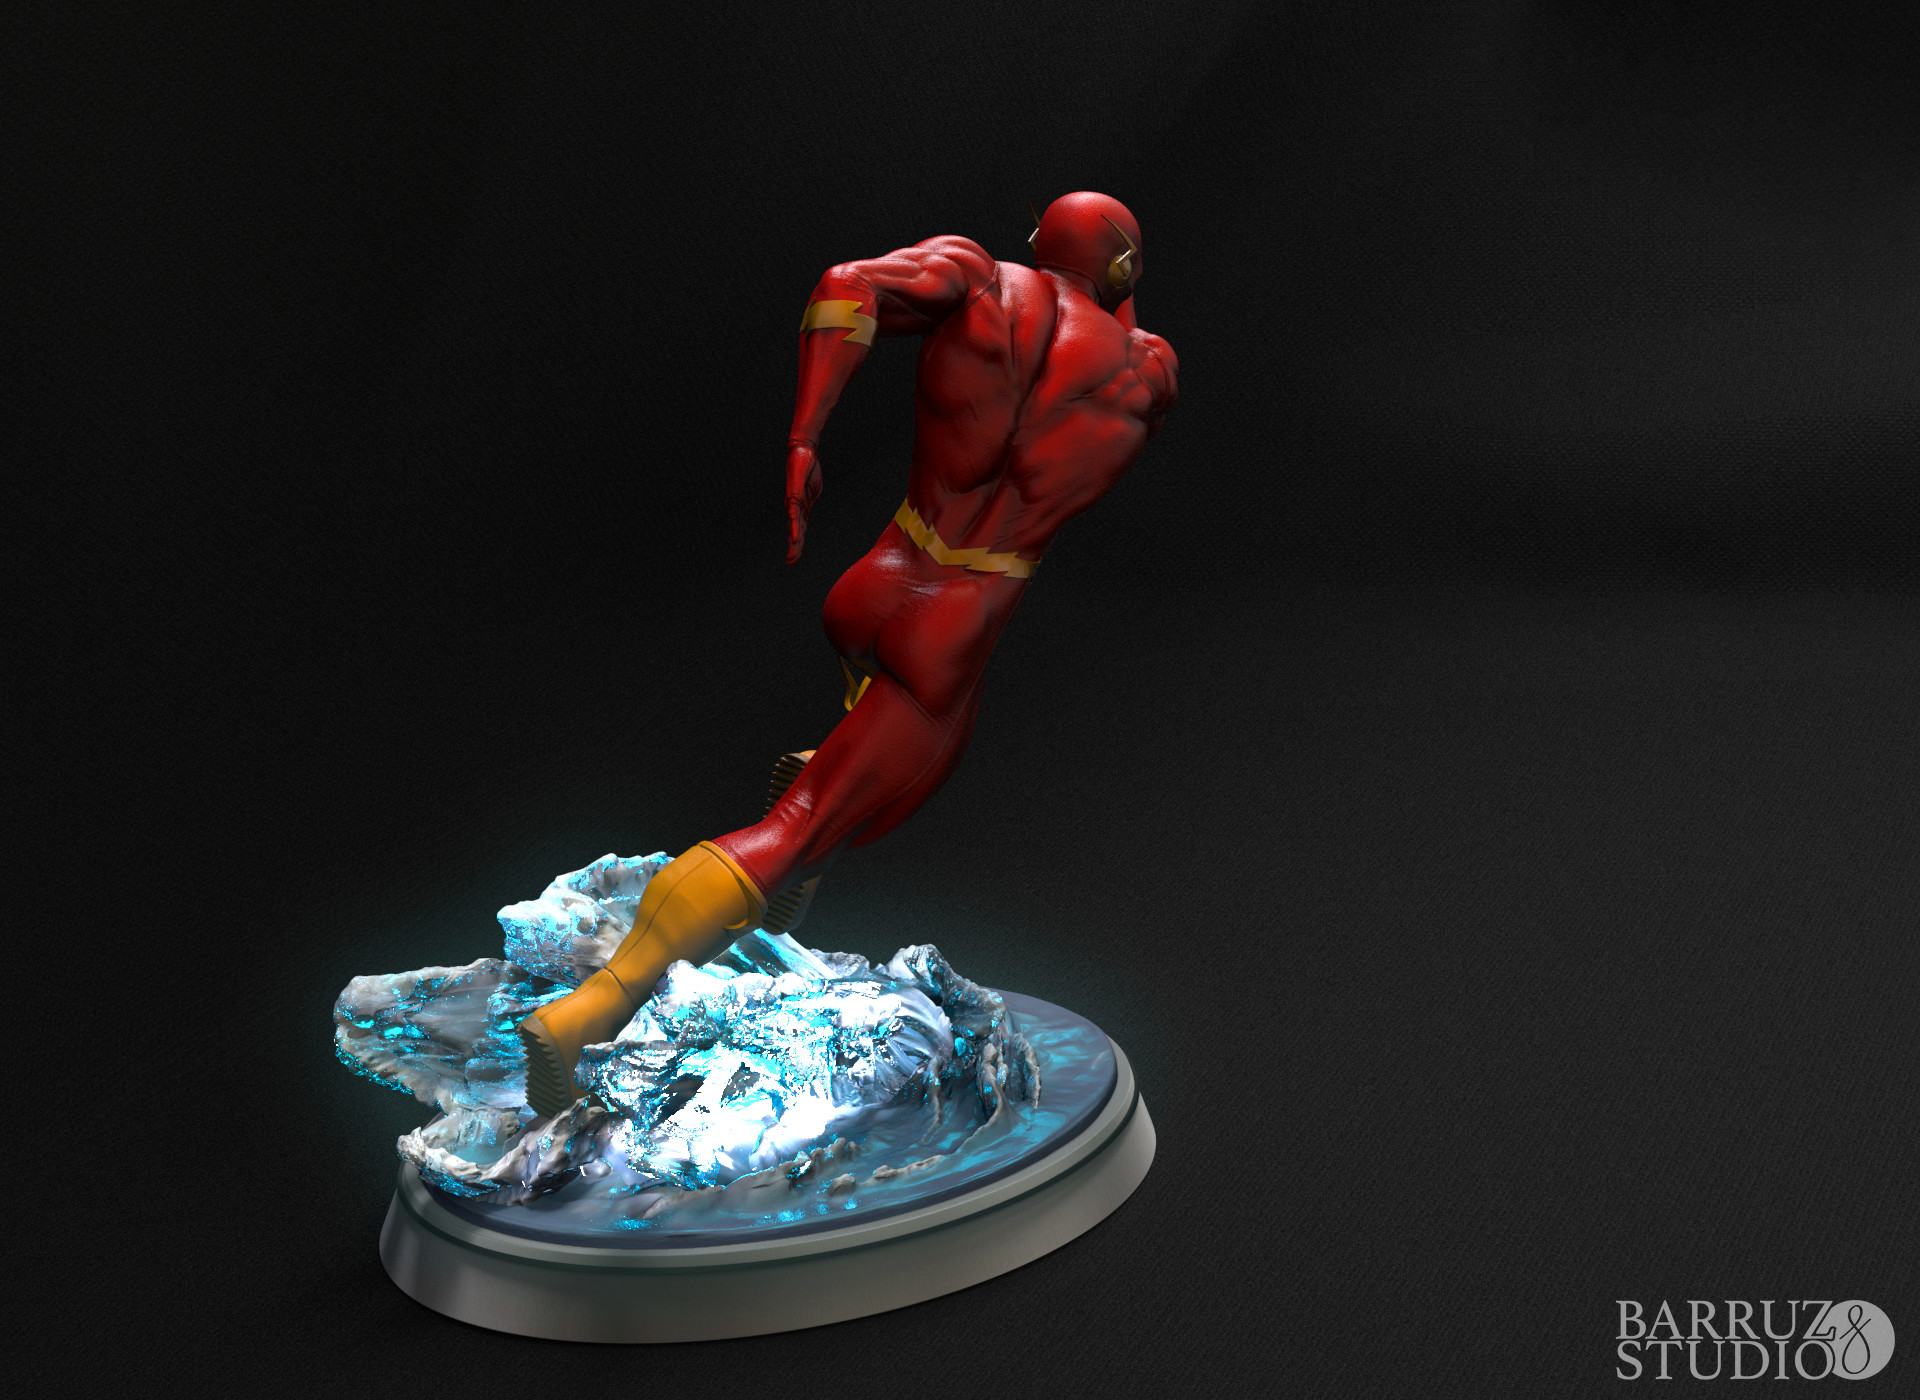 David fernandez barruz 0005 flash overwater 06